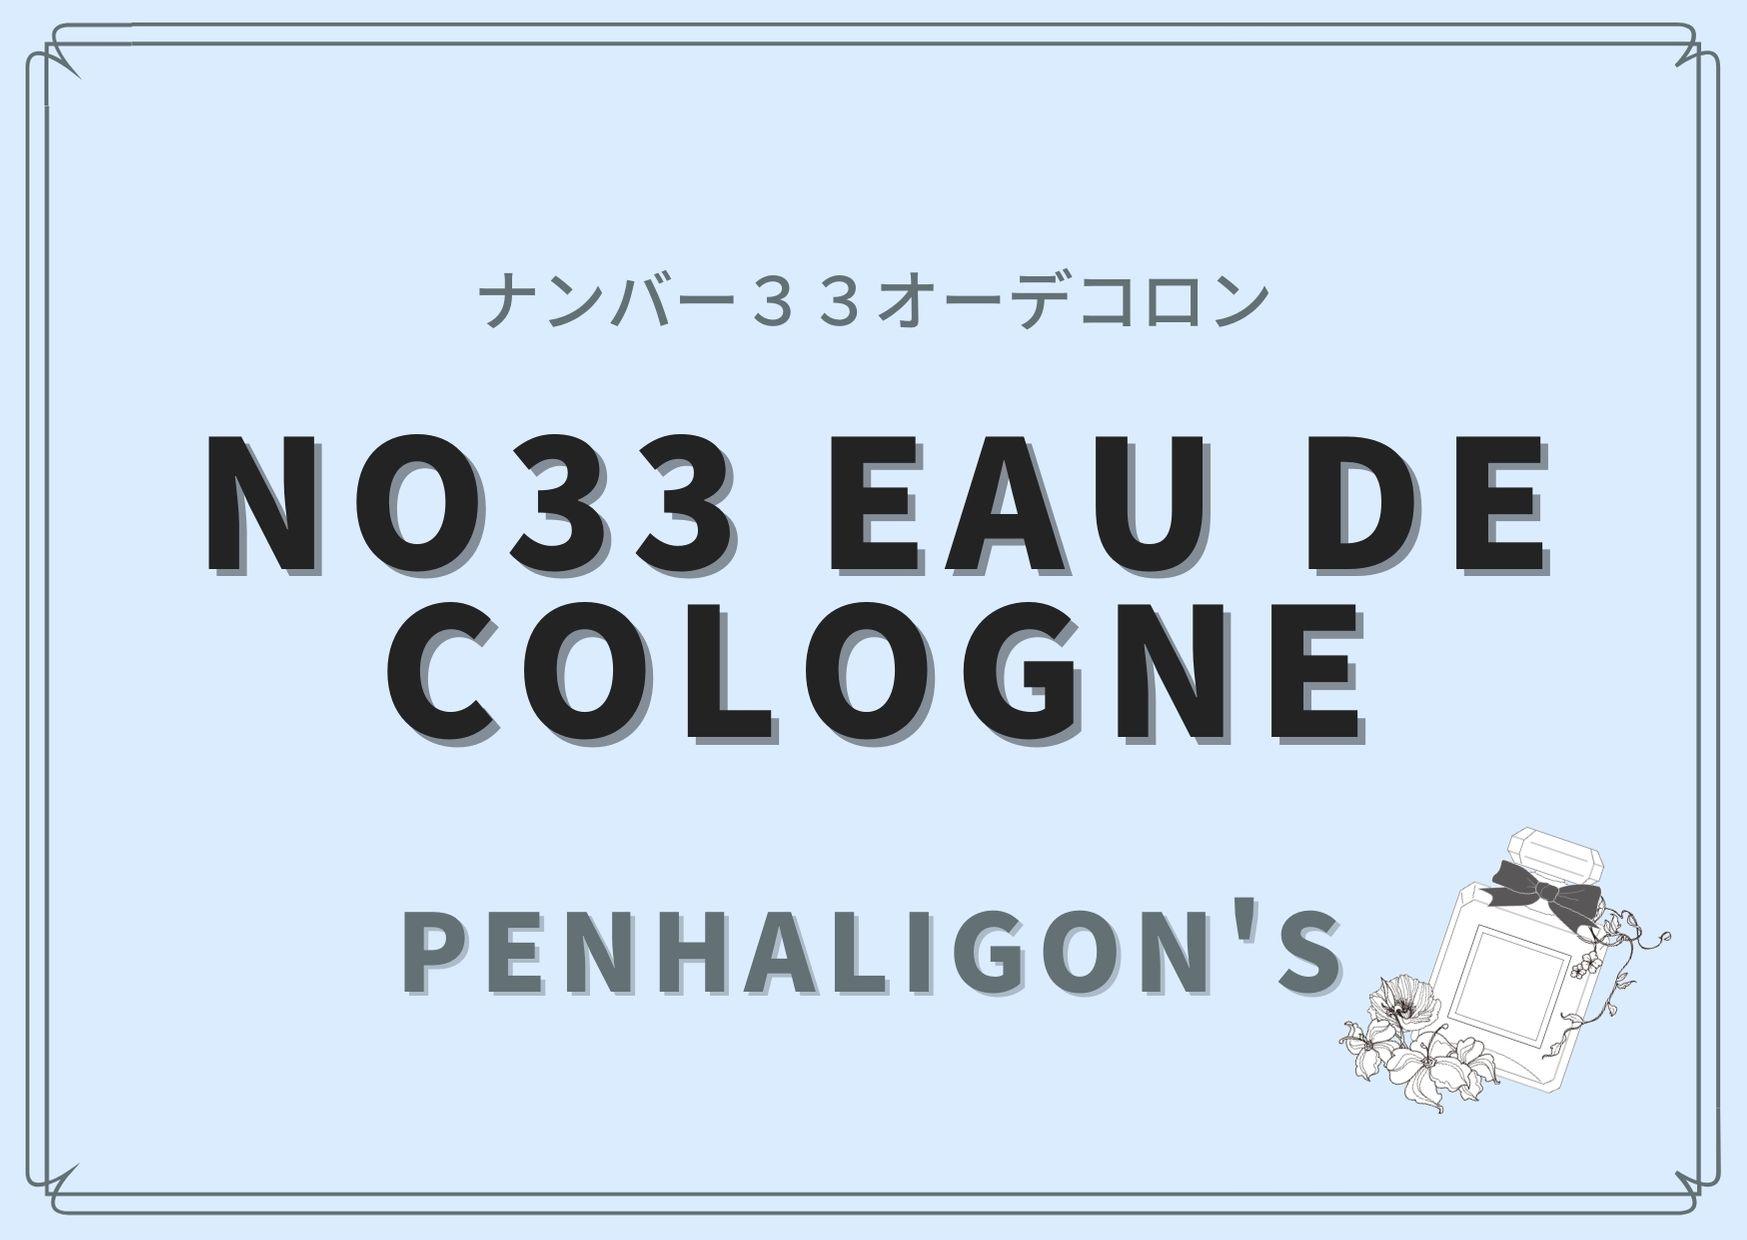 No33 EAU DE COLOGNE(ナンバー33オーデコロン)/PENHALIGON'S(ペンハリガン)